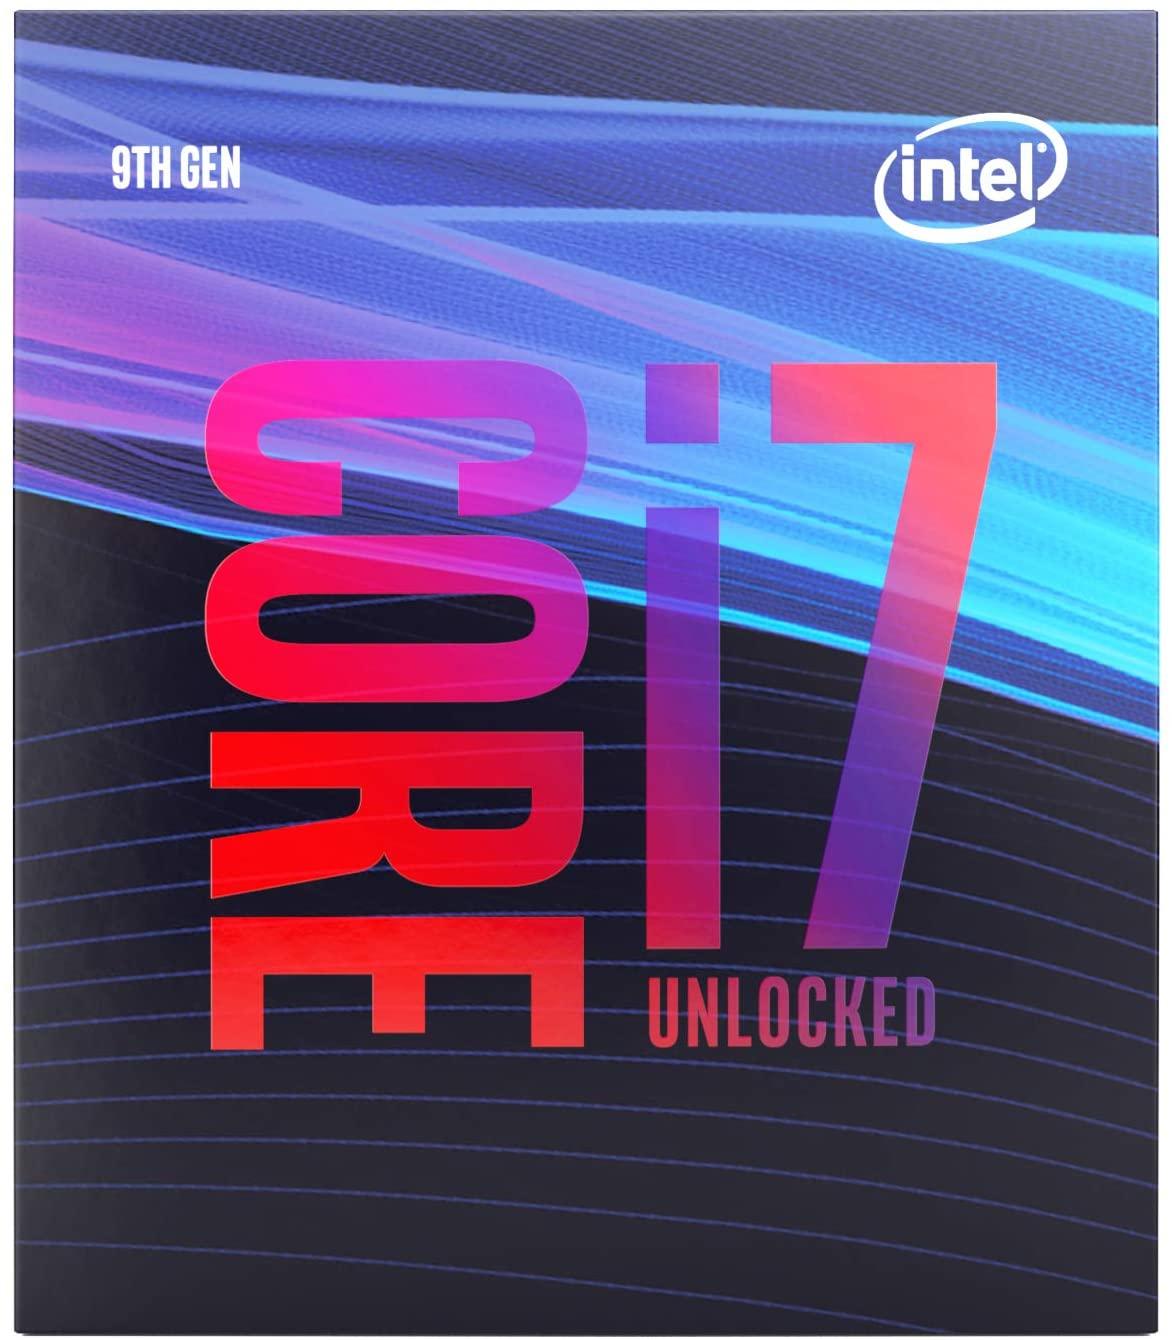 Processeur Intel core i7-9700k - LGA1151 (Frais d'importation inclus)